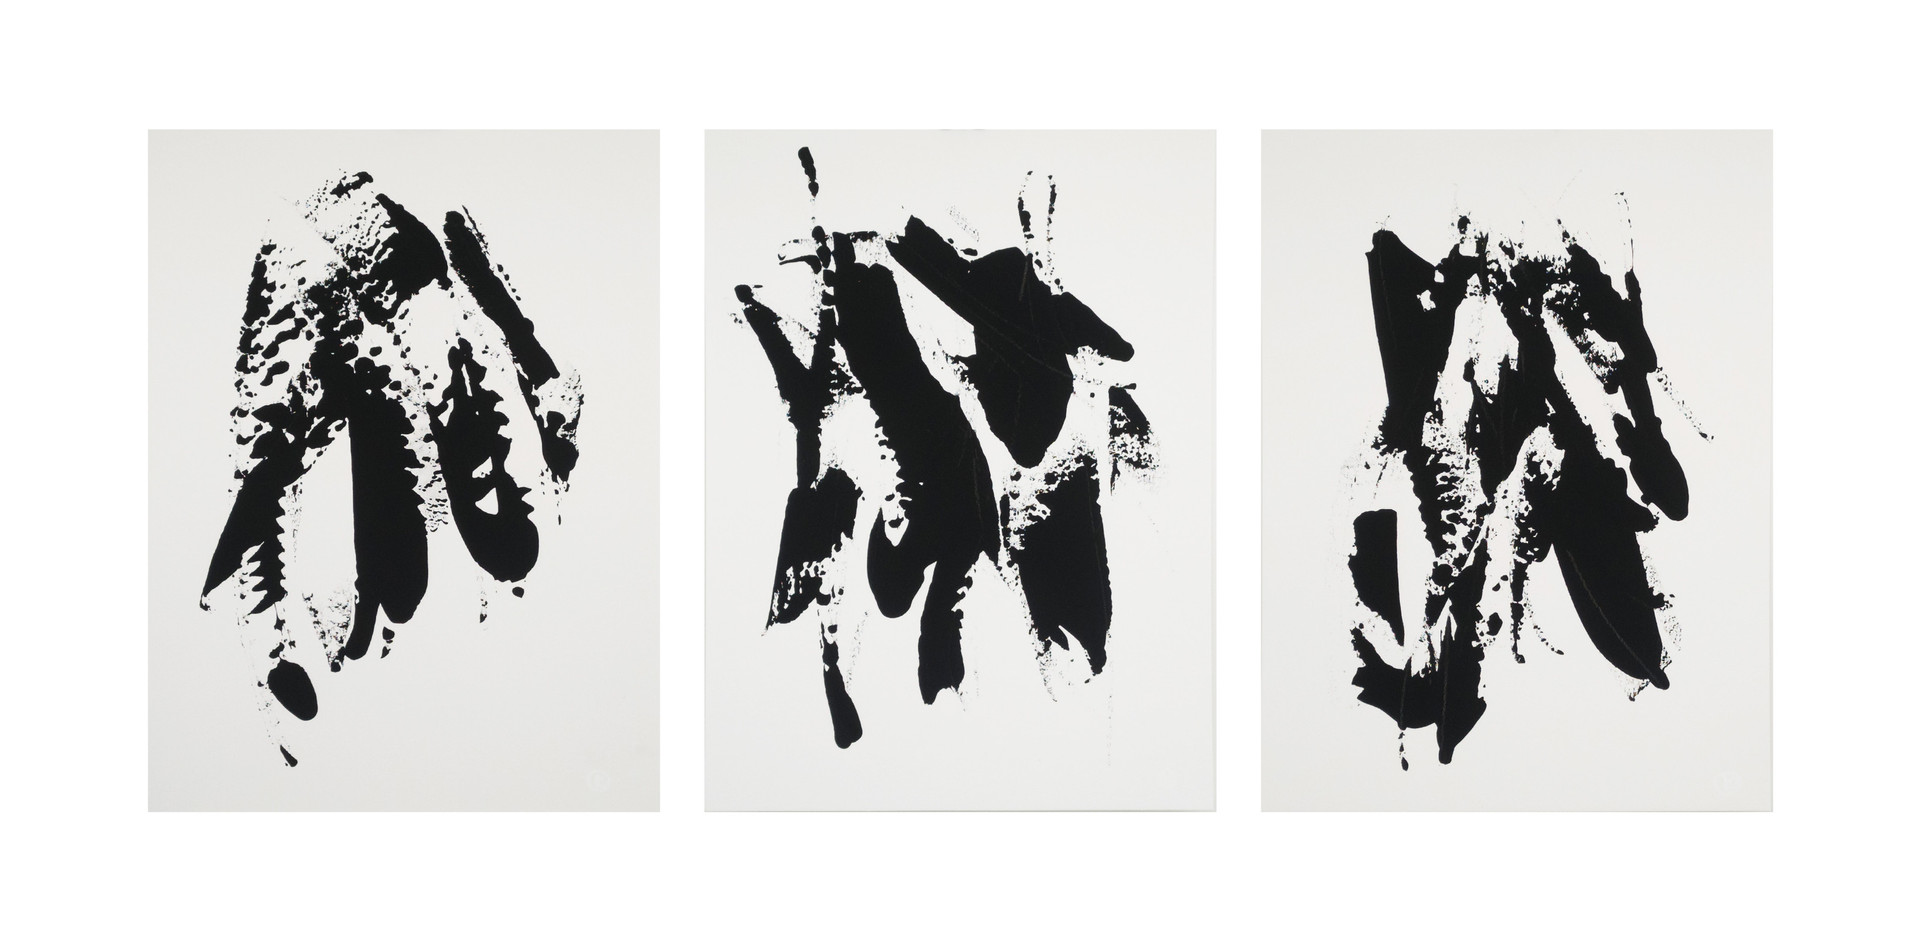 Karina Matheus - Moon night I, II & III (triptych)